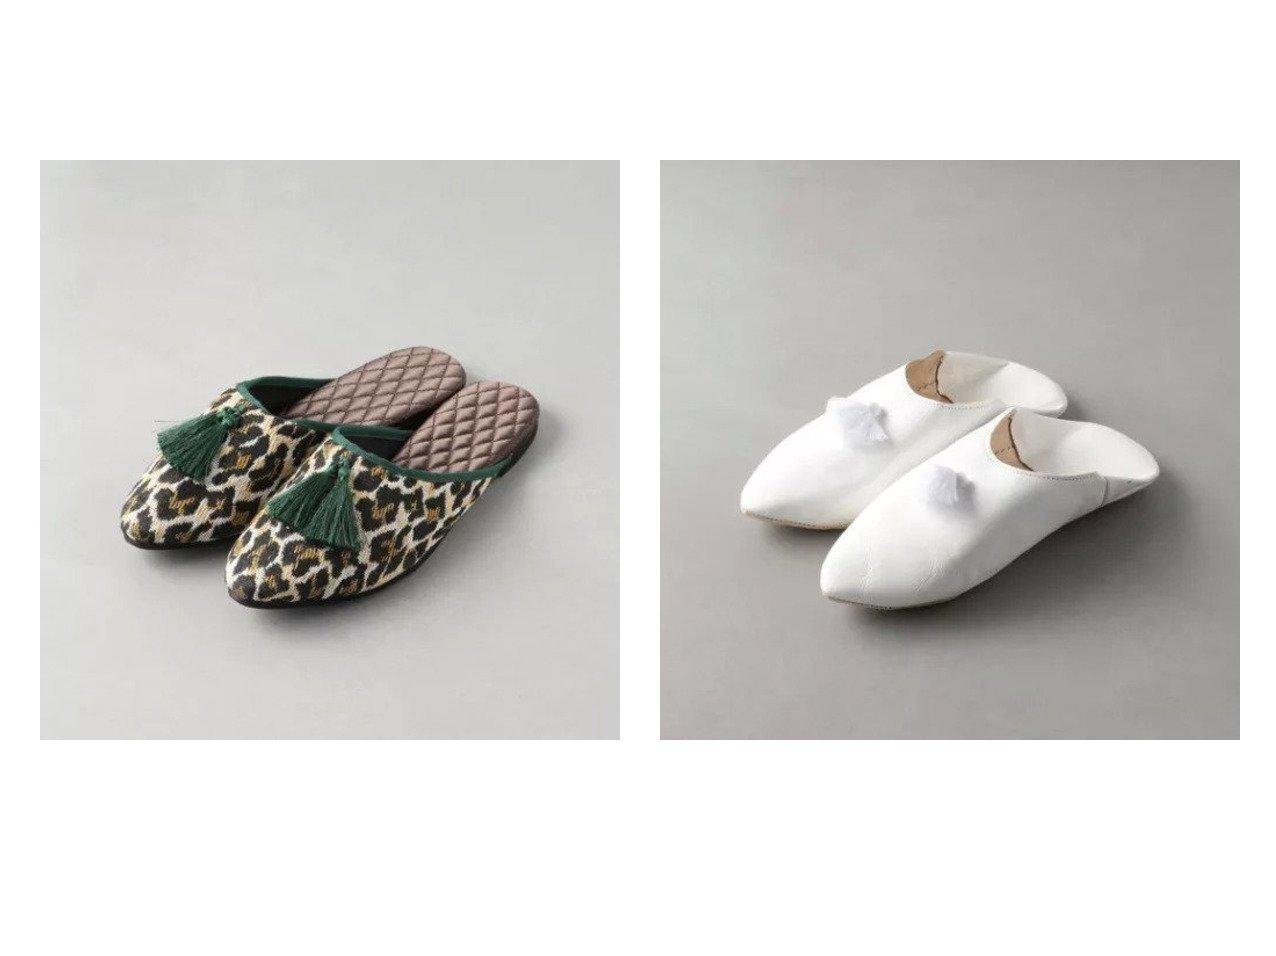 【Odette e Odile/オデット エ オディール】のOFD タッセルルームシューズ FLT10&【別注】Fatima Morocco バブーシュP オデット エ オディールのおすすめ!人気、トレンド・レディースファッションの通販 おすすめで人気の流行・トレンド、ファッションの通販商品 メンズファッション・キッズファッション・インテリア・家具・レディースファッション・服の通販 founy(ファニー) https://founy.com/ シューズ スタイリッシュ タッセル 別注 お家時間・ステイホーム Home time,Stay home インソール リラックス  ID:crp329100000021934